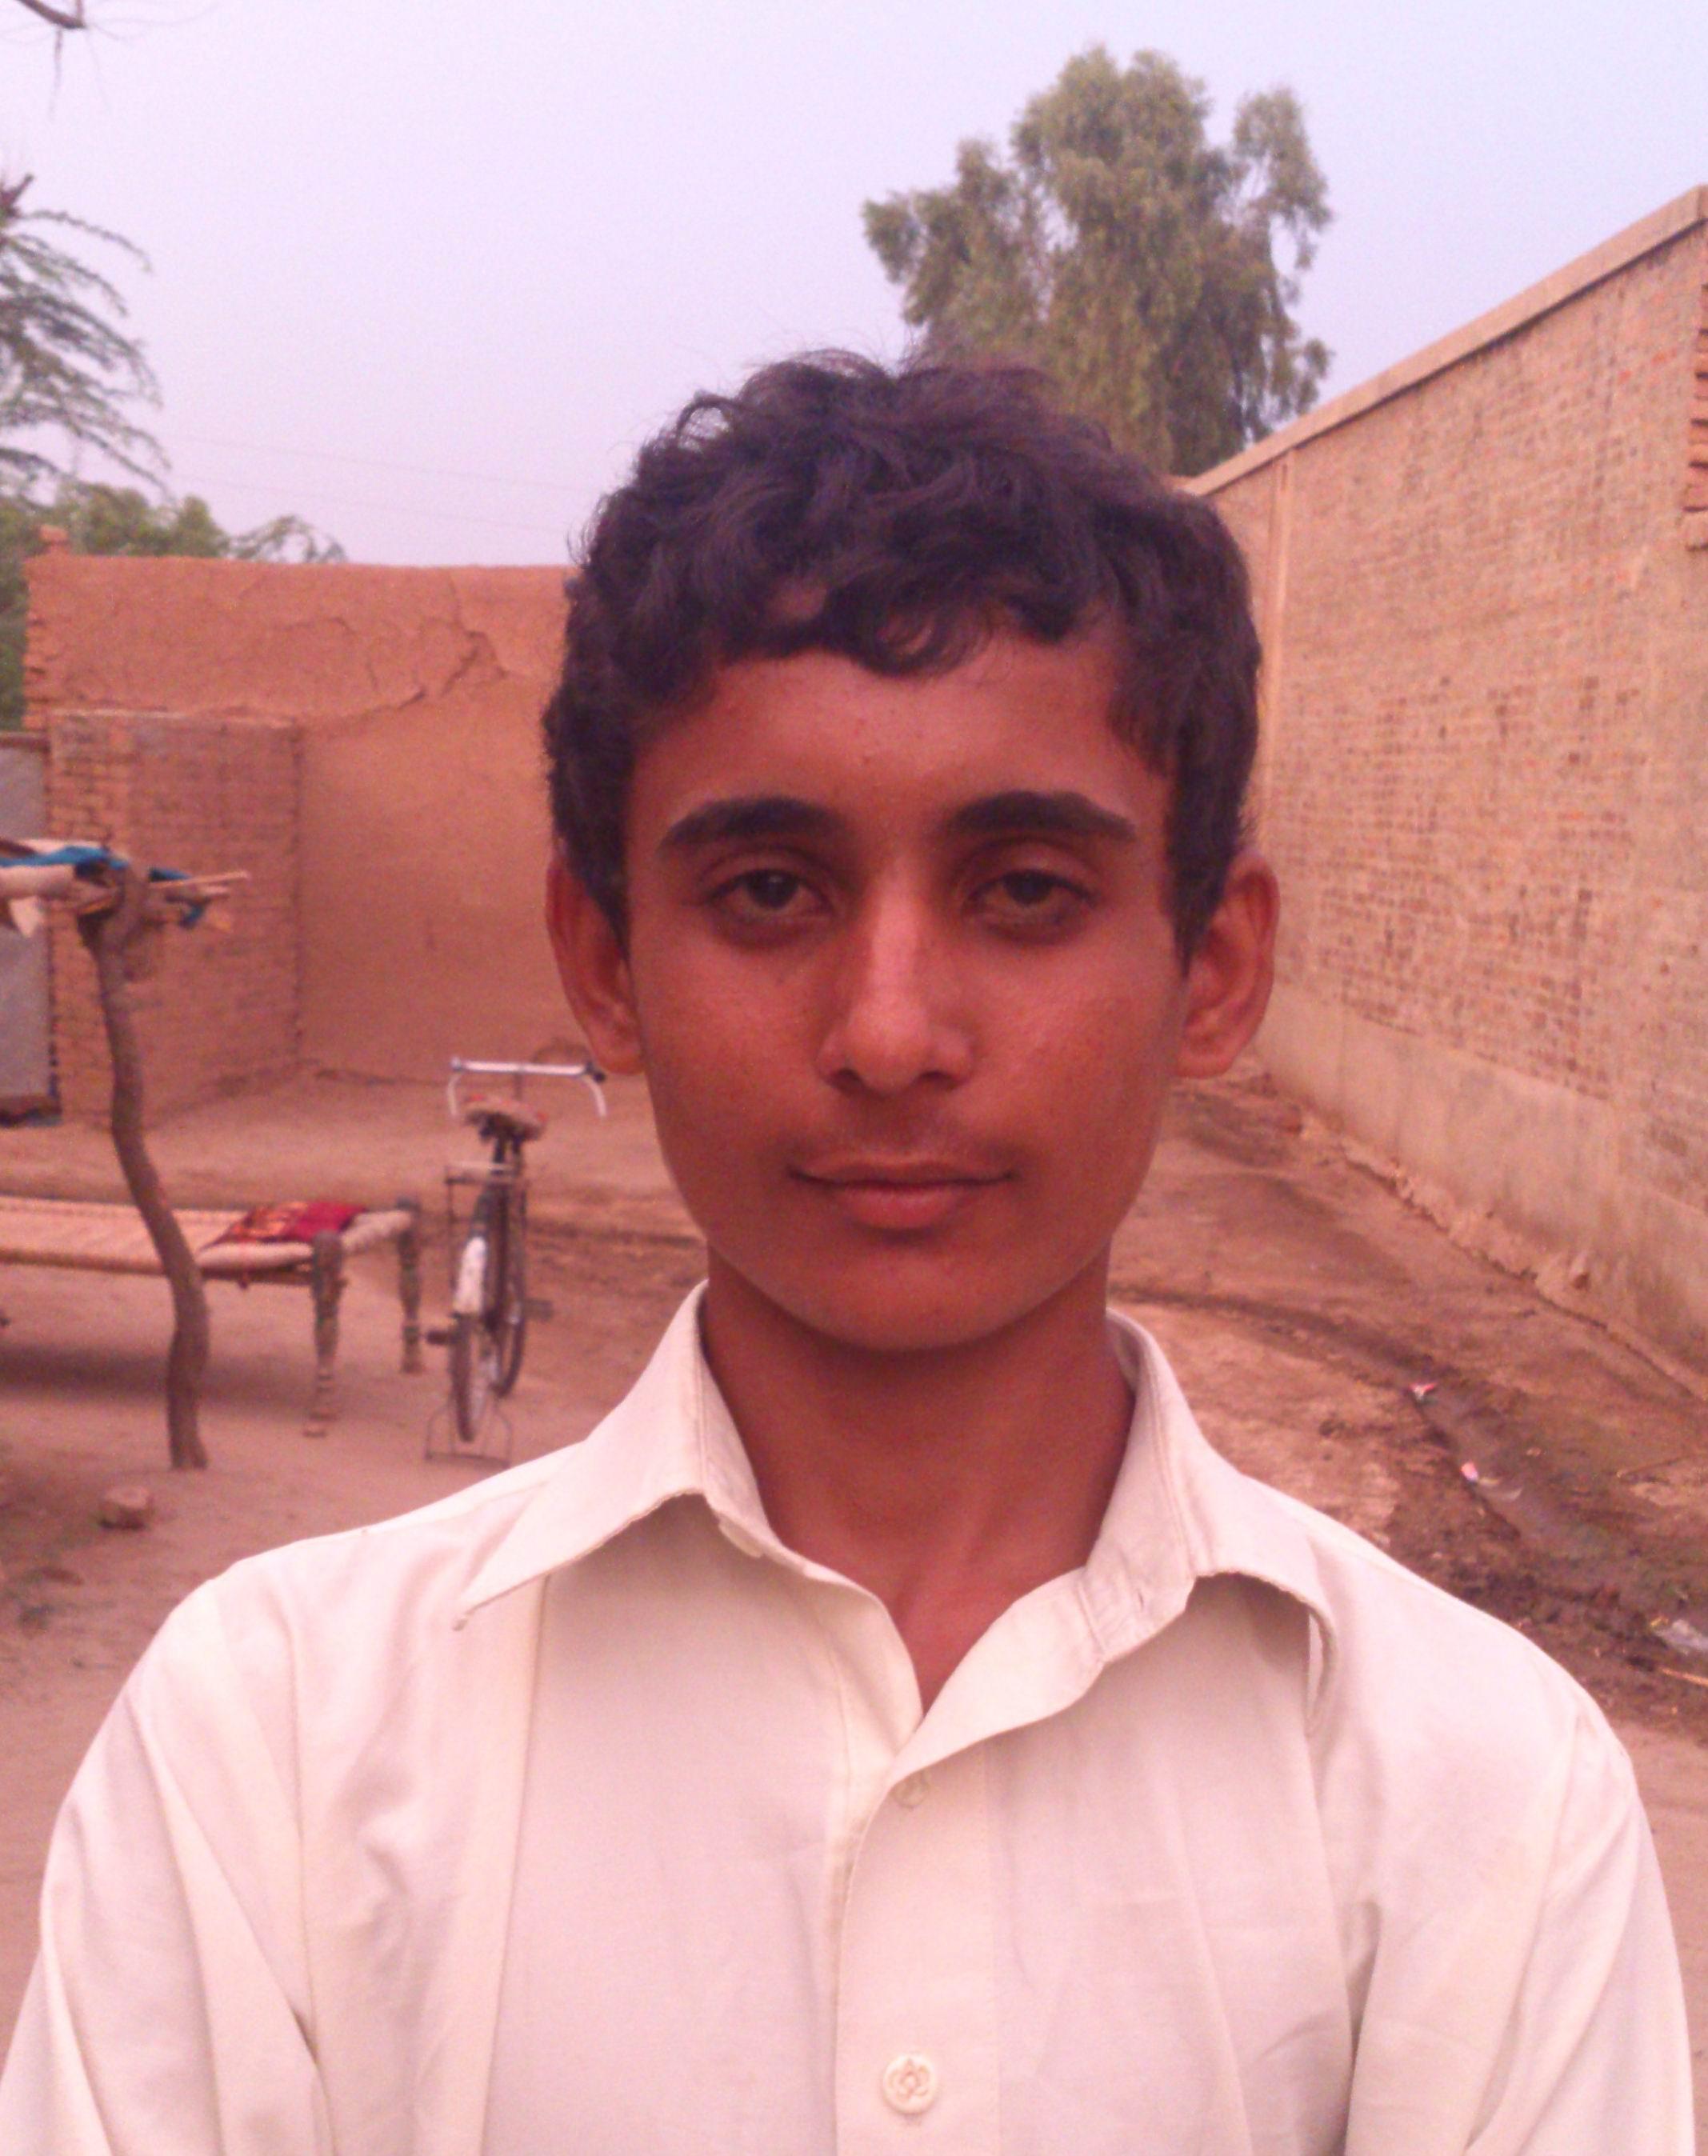 Muhammad Saqlain